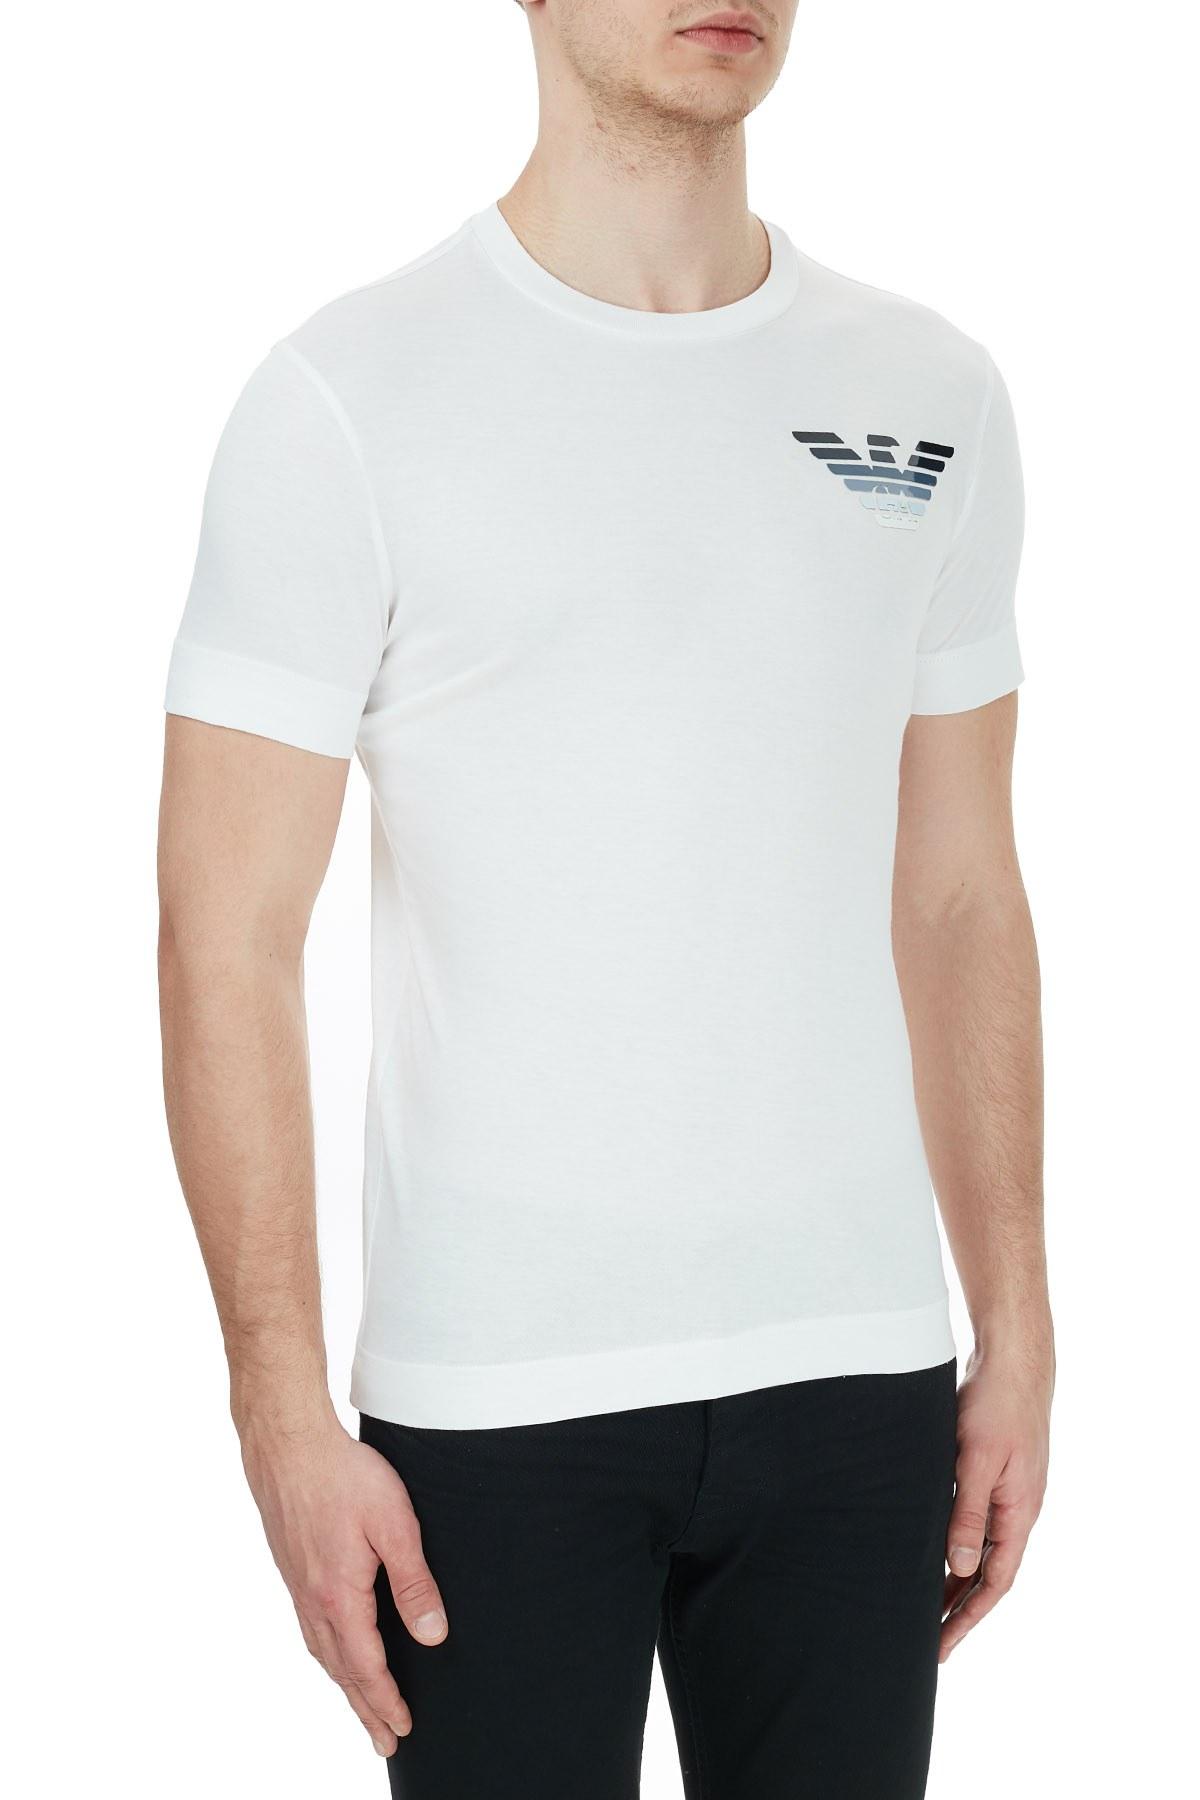 Emporio Armani Logo Baskılı Bisiklet Yaka % 100 Pamuk Erkek T Shirt 6H1T6G 1JSHZ 0101 BEYAZ